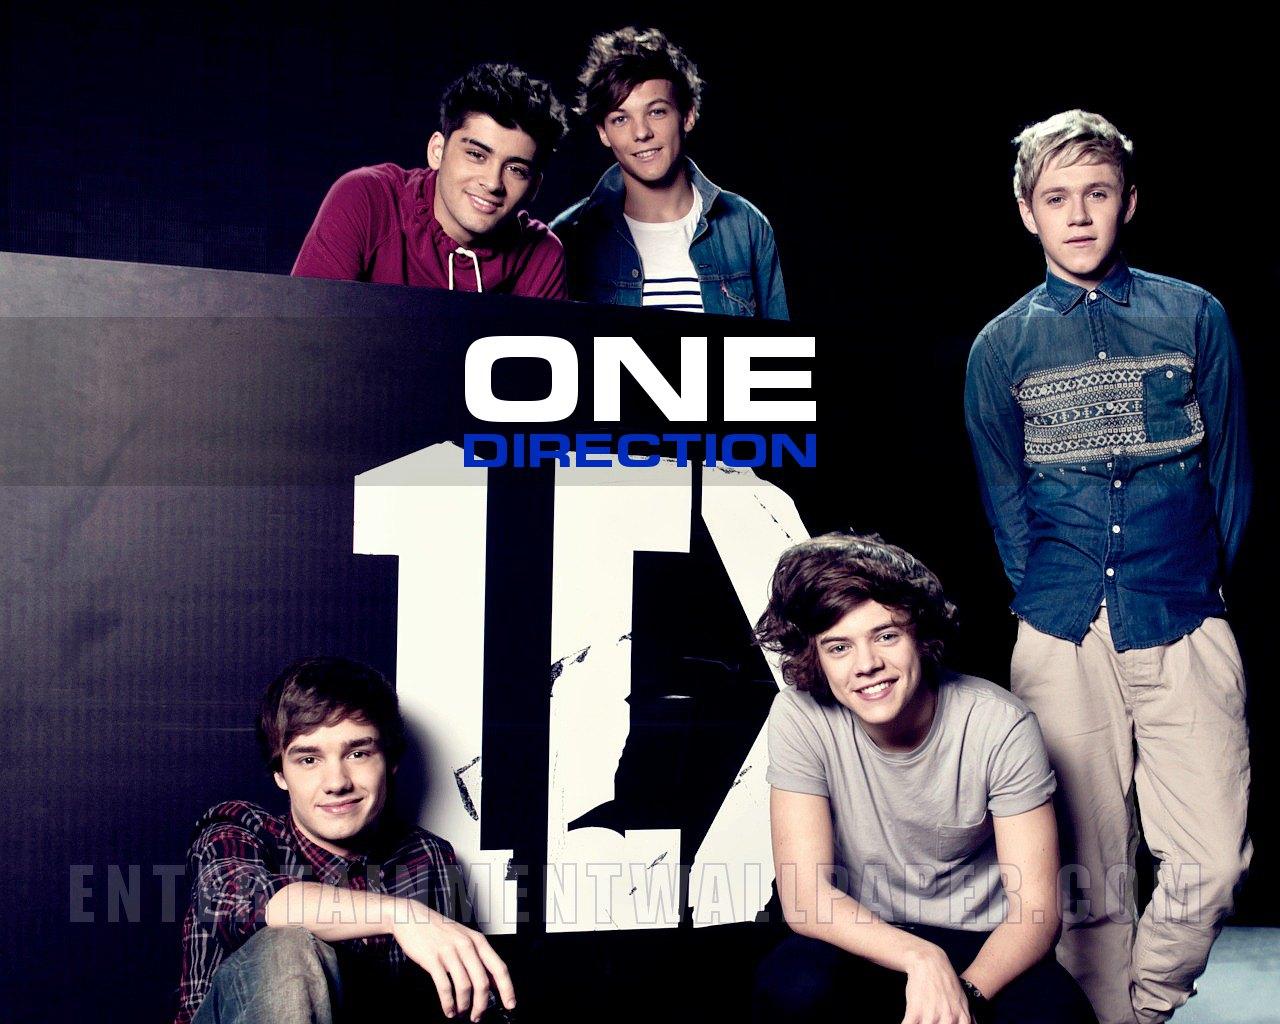 One Direction Wallpaper One Direction Wallpaper 34596452 1280x1024